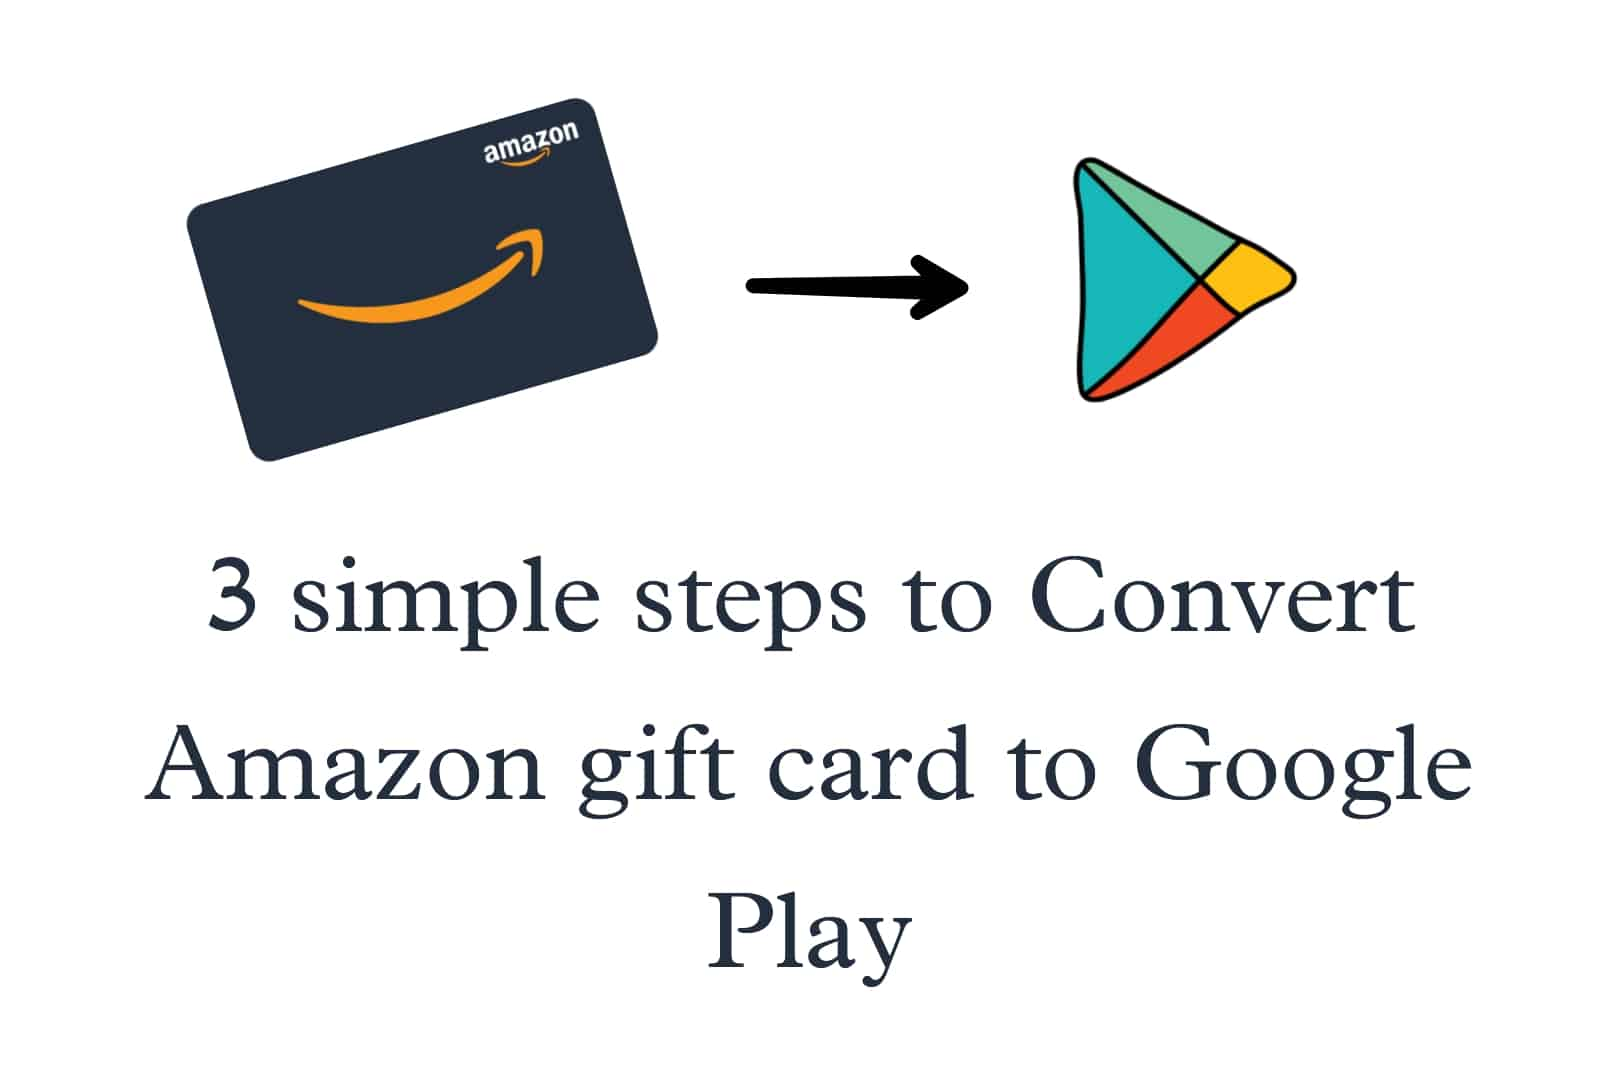 convert Amazon gift card to Google play